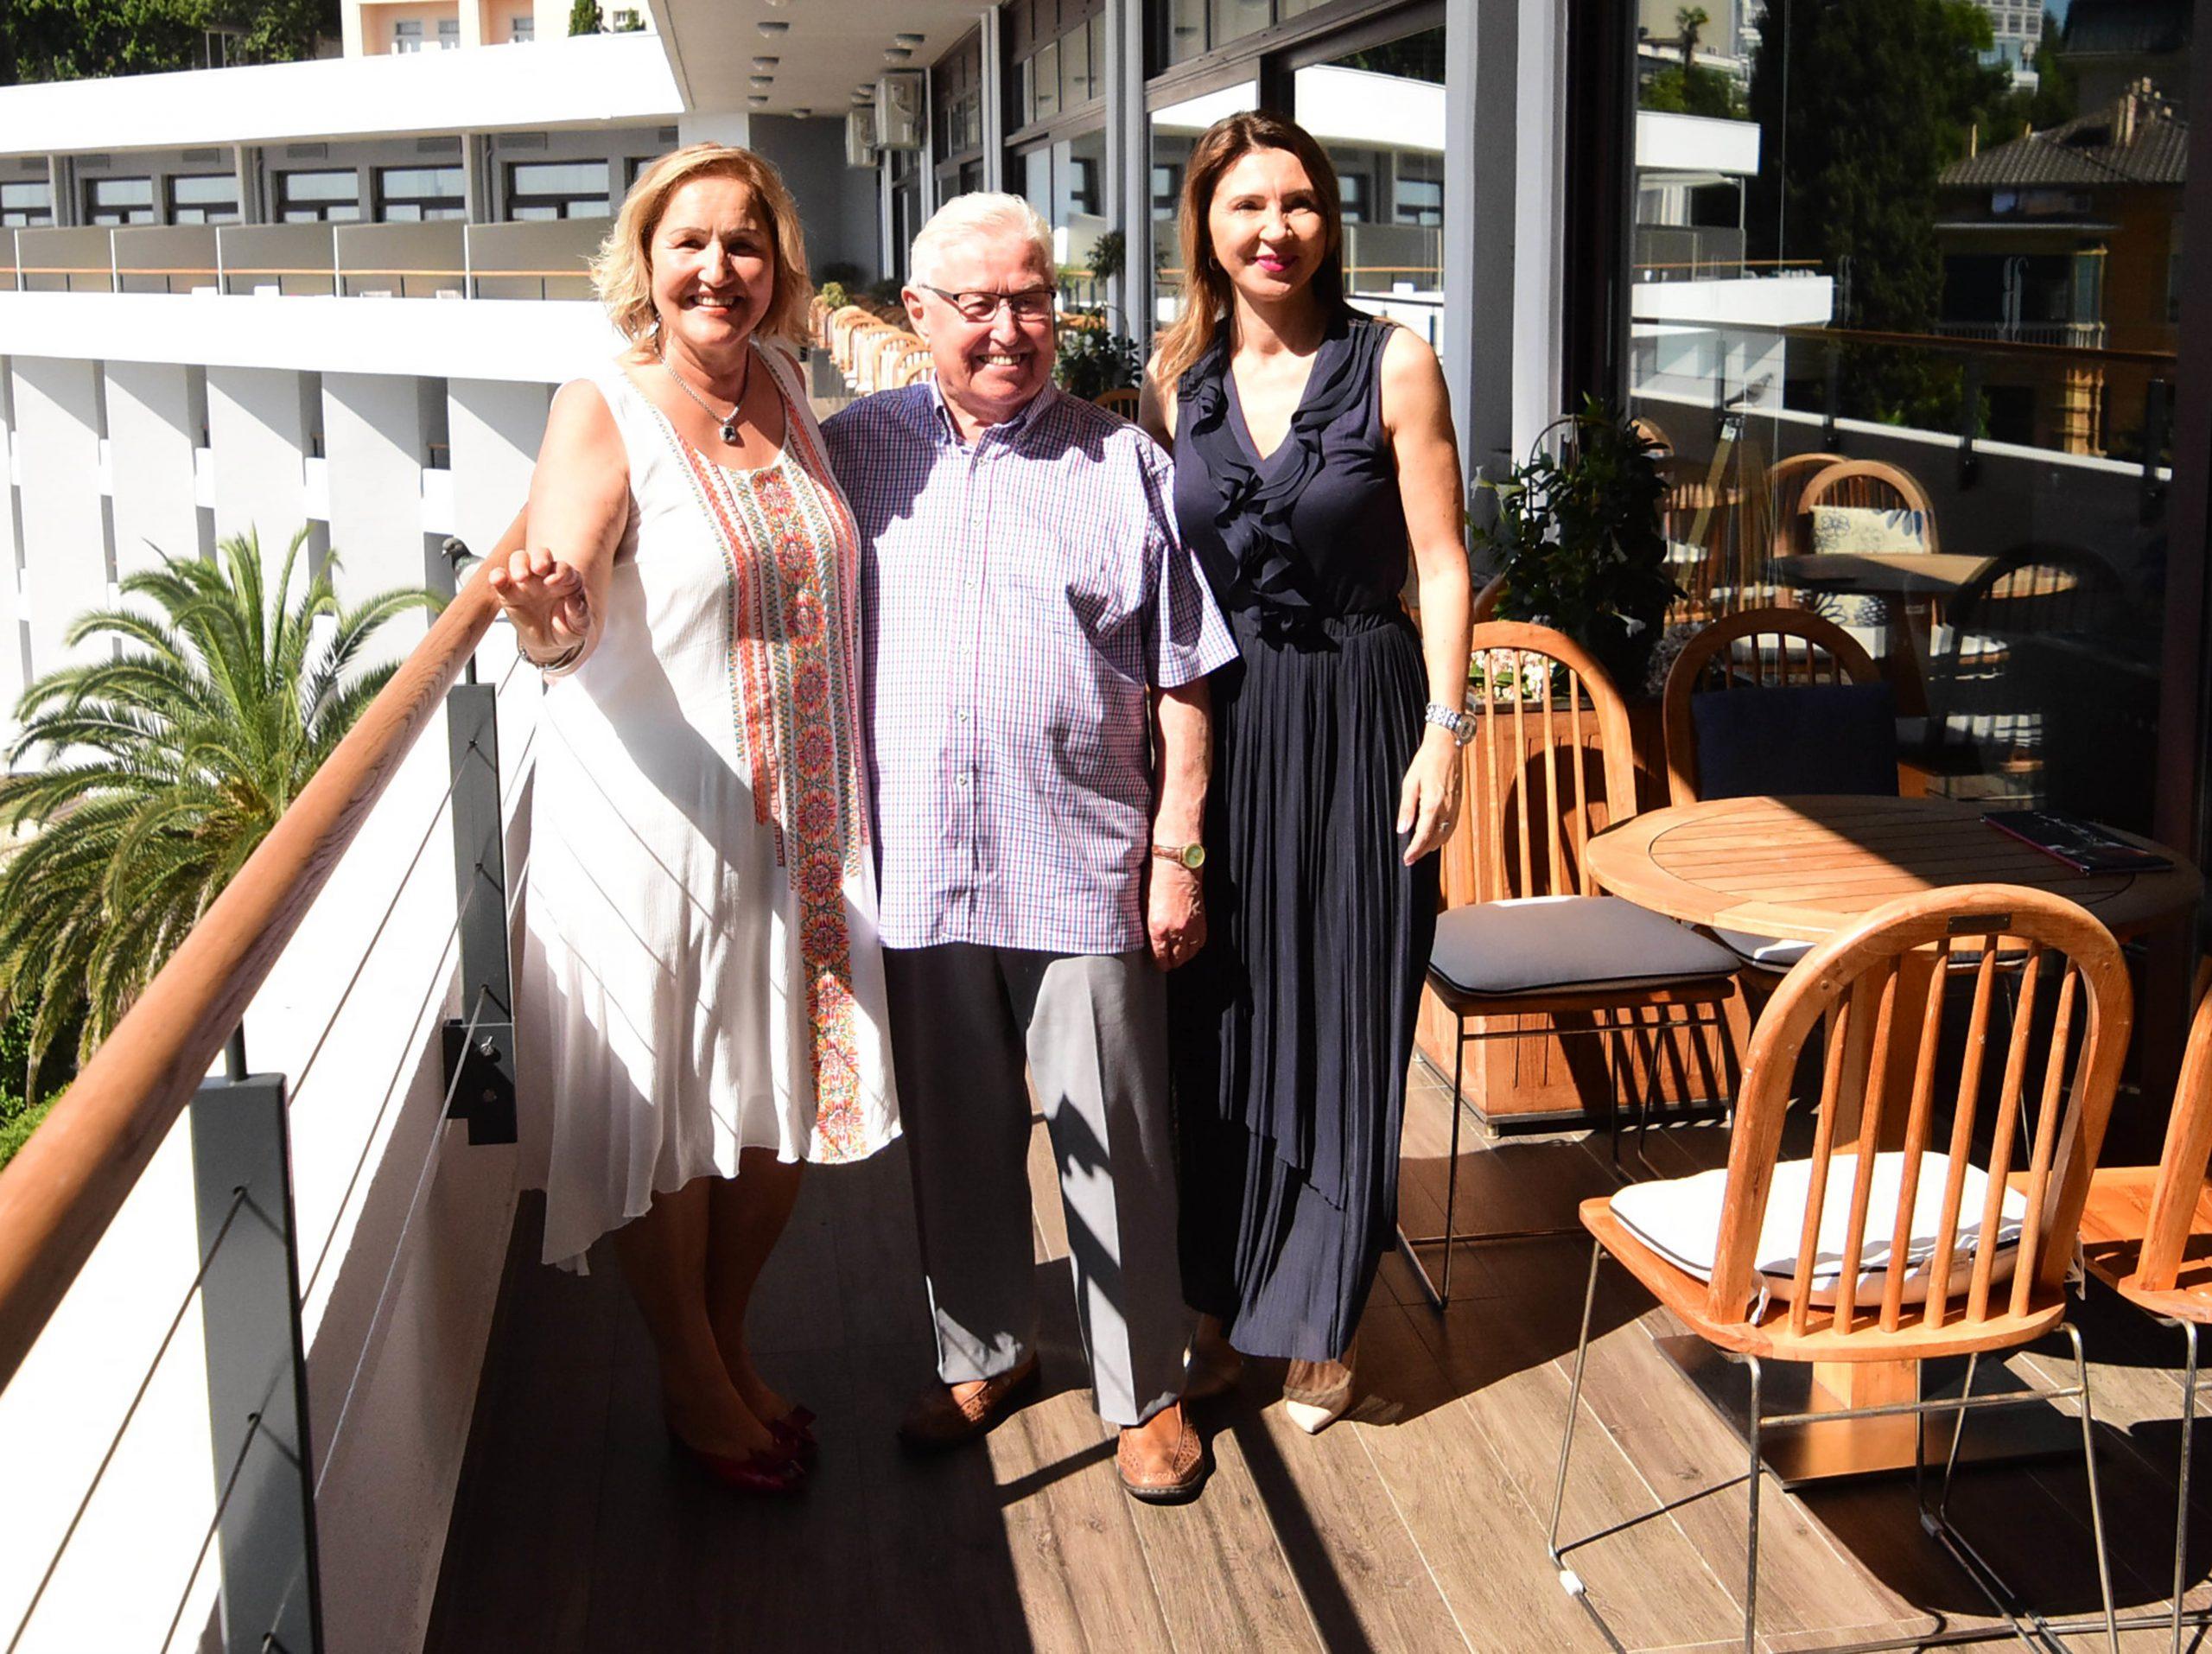 Katarina Hauptfeld, Lennart Karlsson i Vera Aničić u hotelu Admiral / Snimio Marin ANIČIĆ